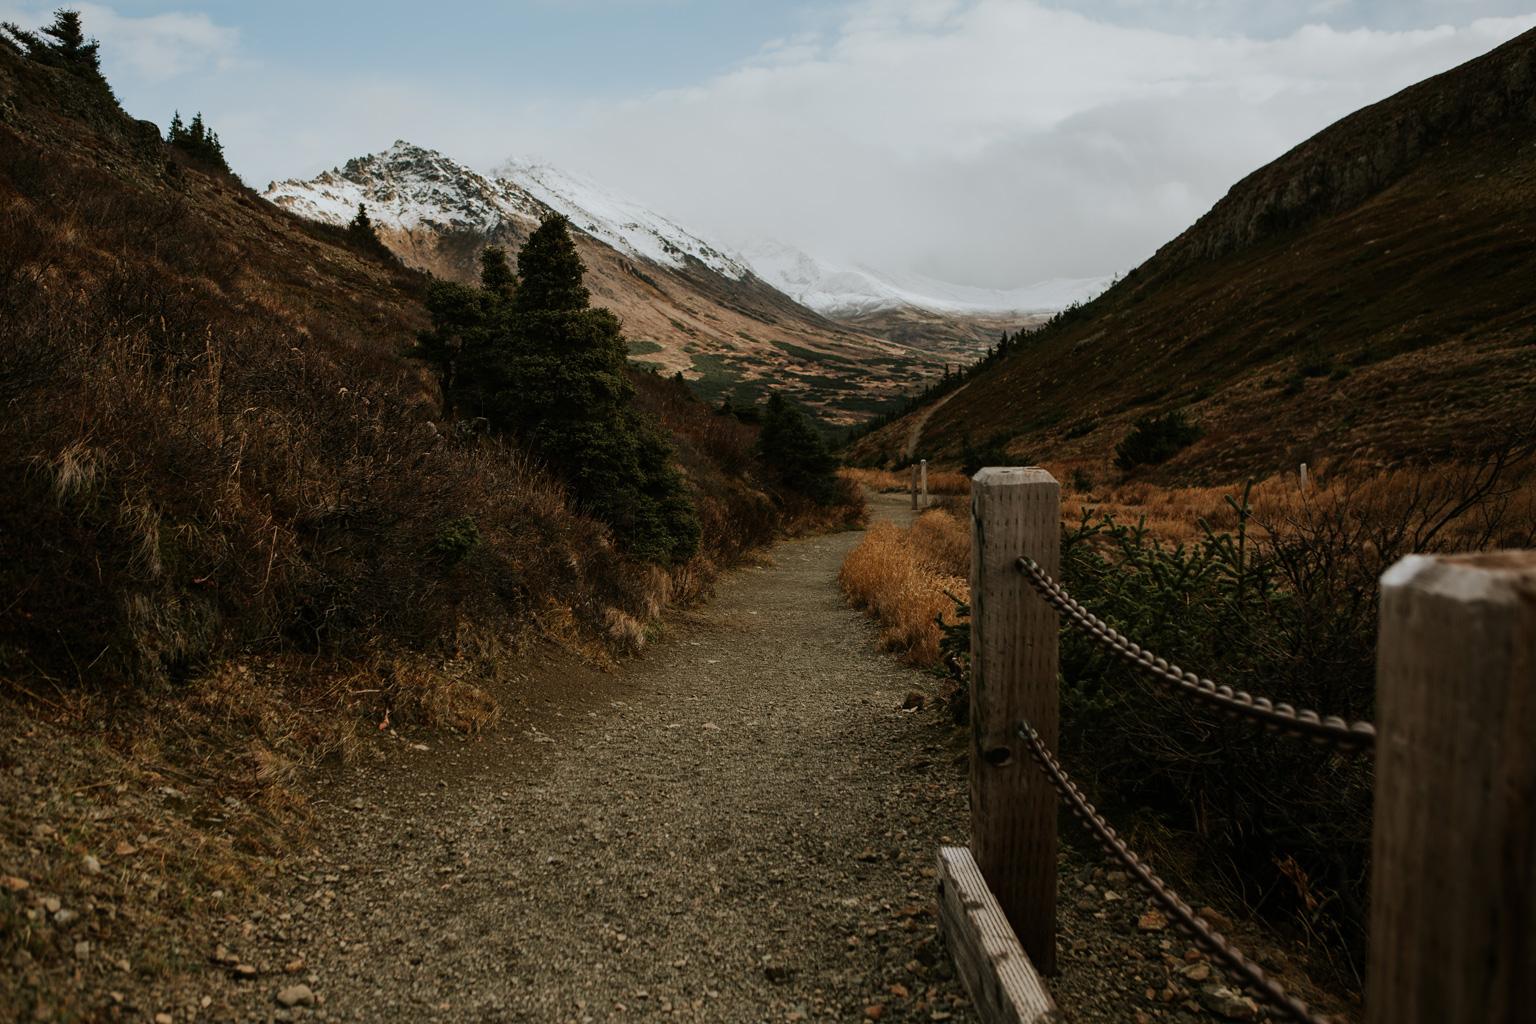 CindyGiovagnoli_Anchorage_Alaska_Flattop_mountain_hike_snocapped-016.jpg